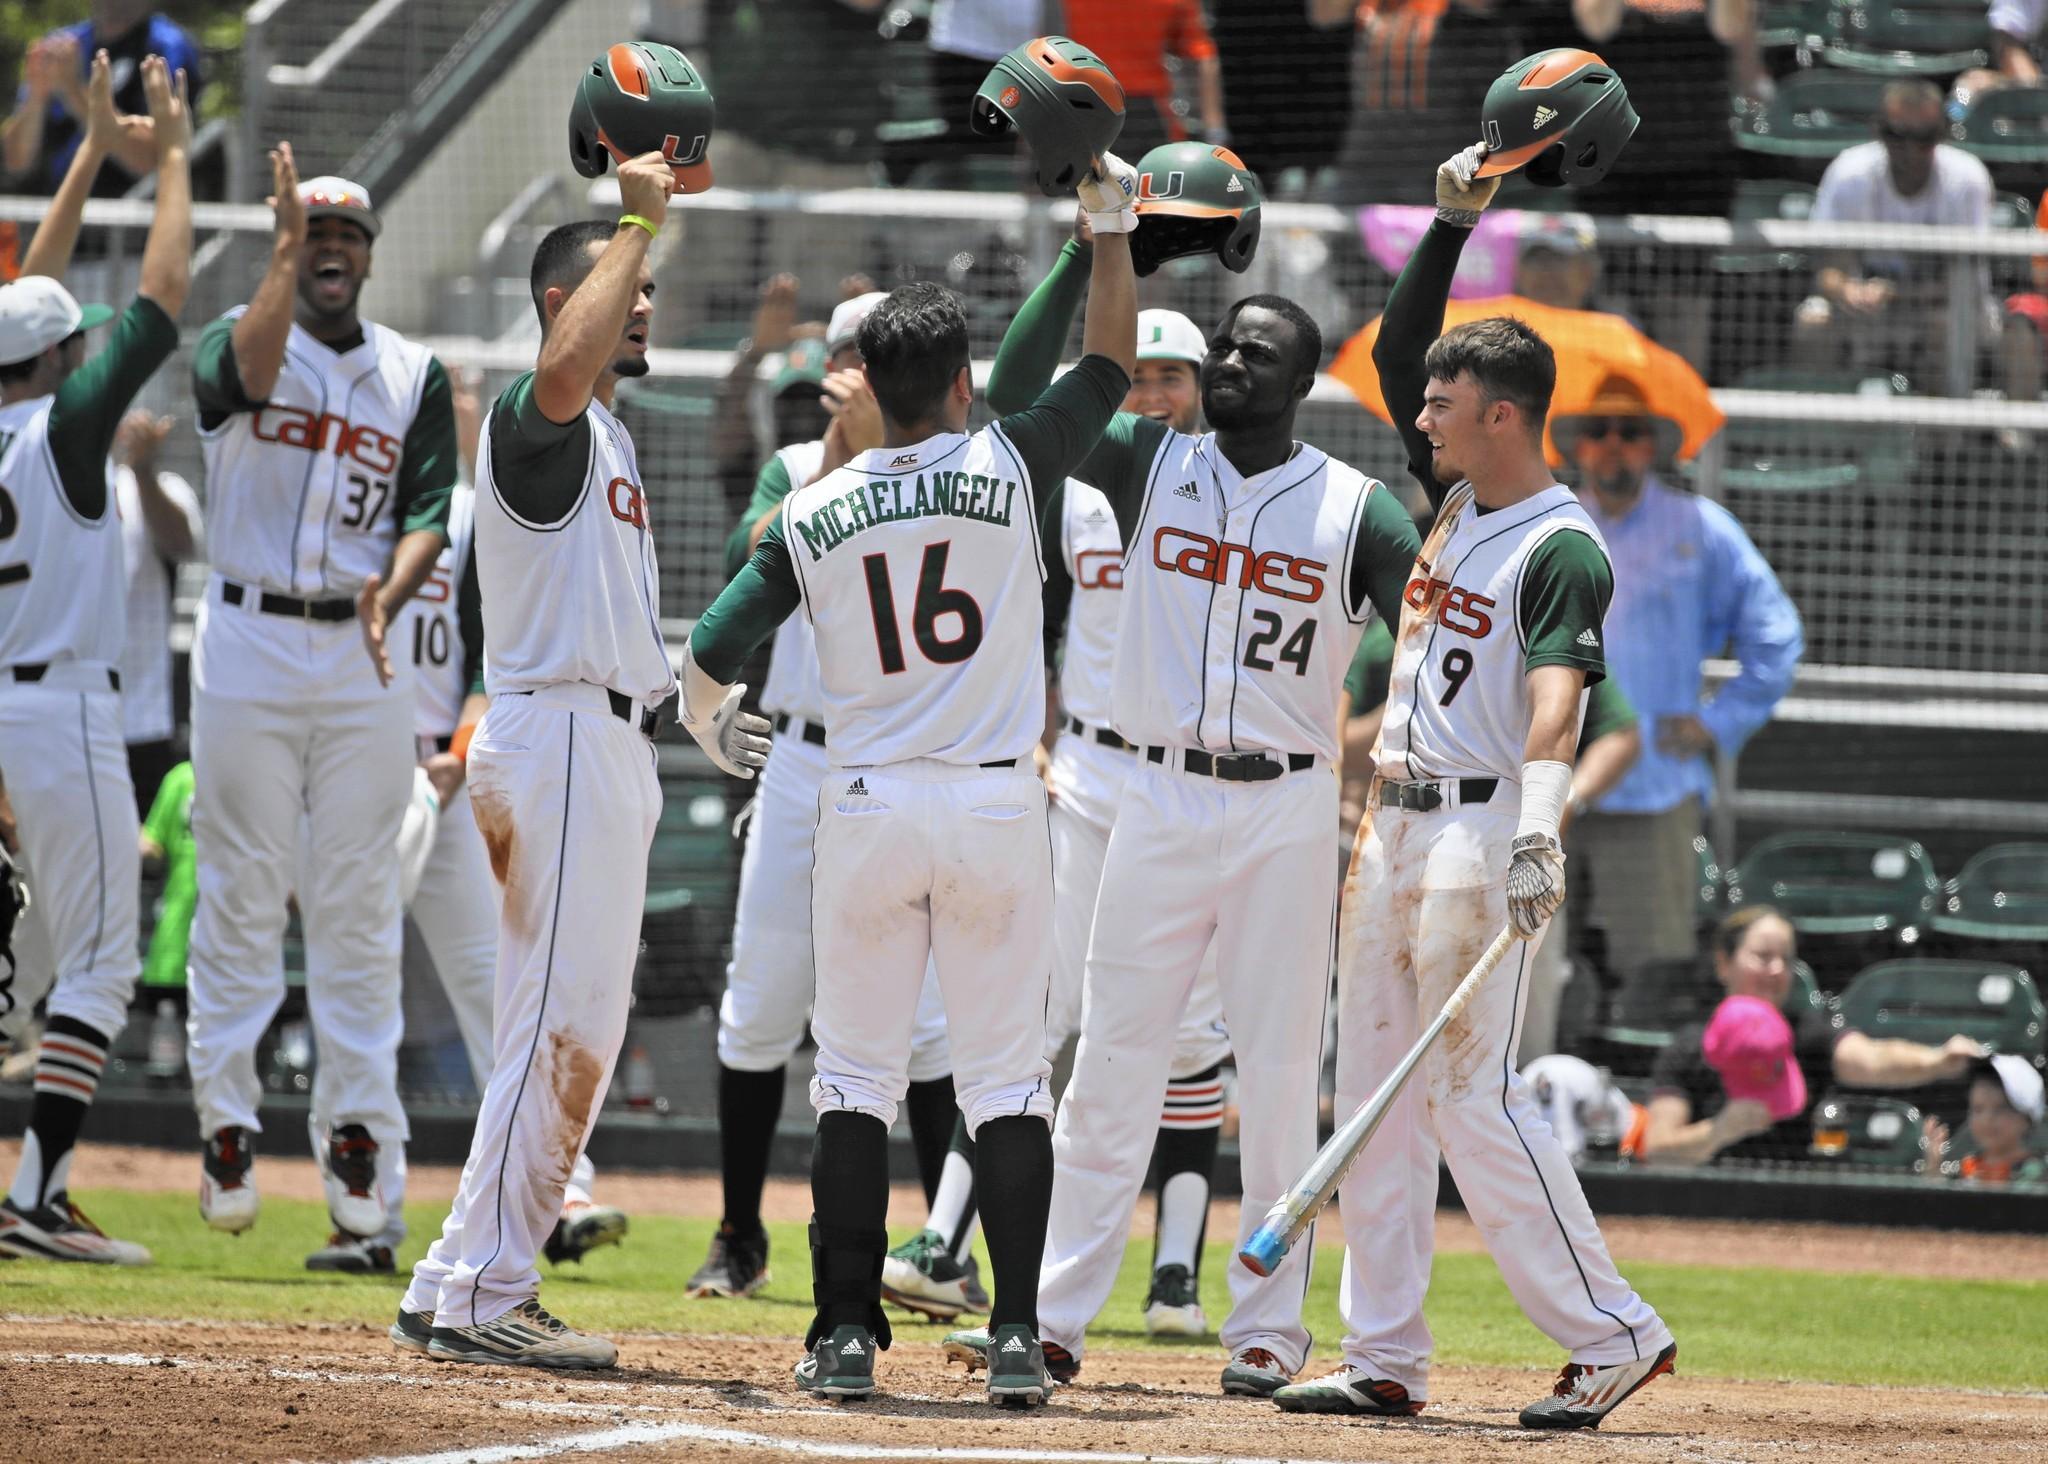 Fl-miami-baseball-0613-20160612